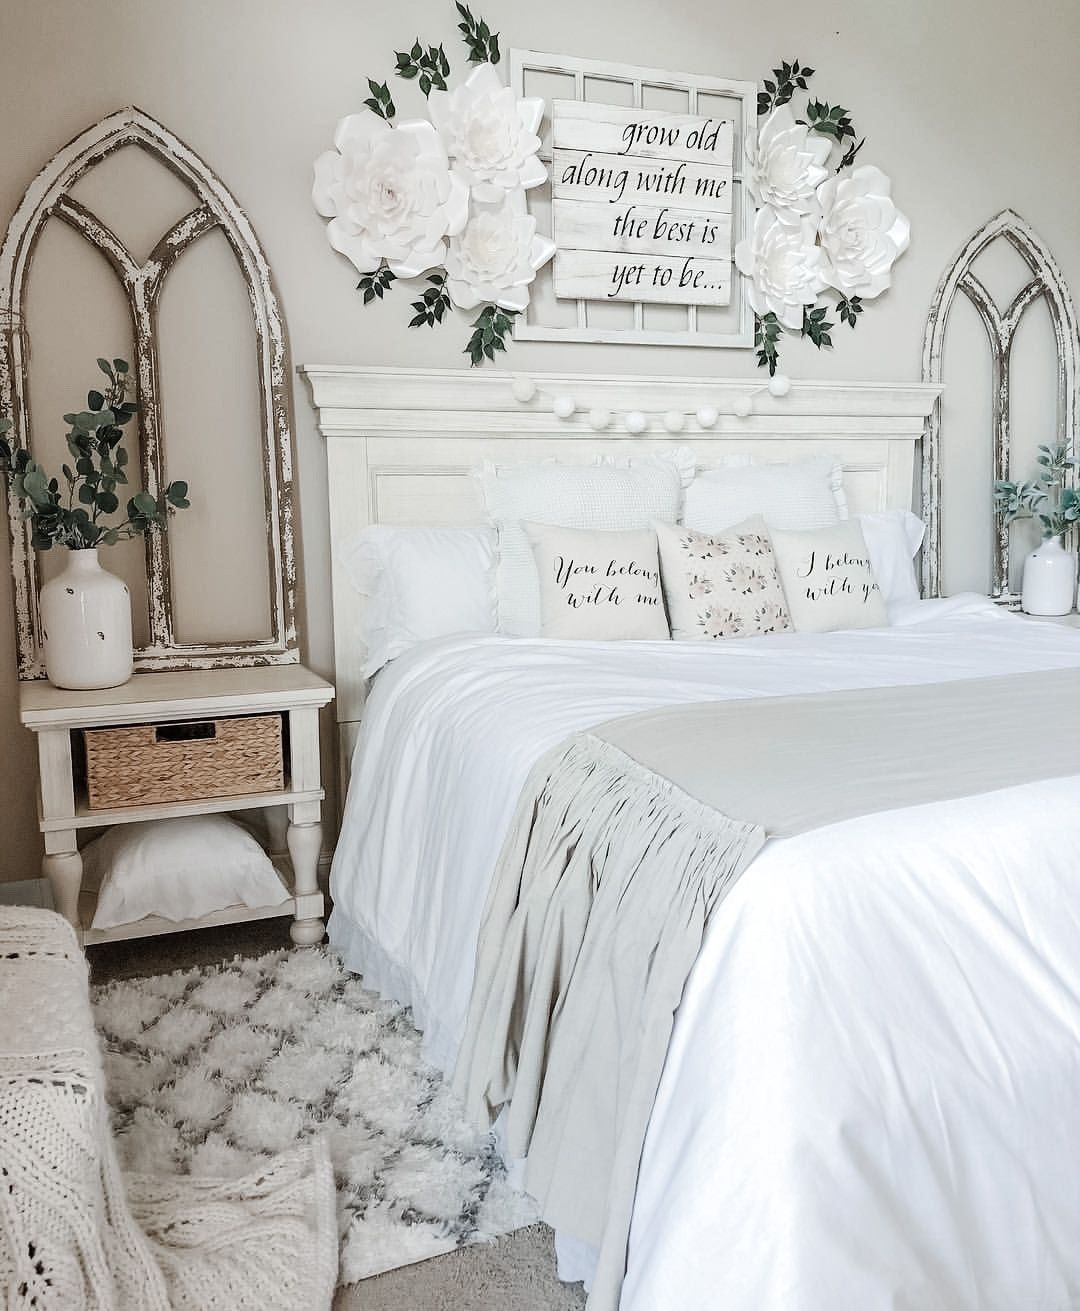 30+ Farm bedroom decor ideas in 2021